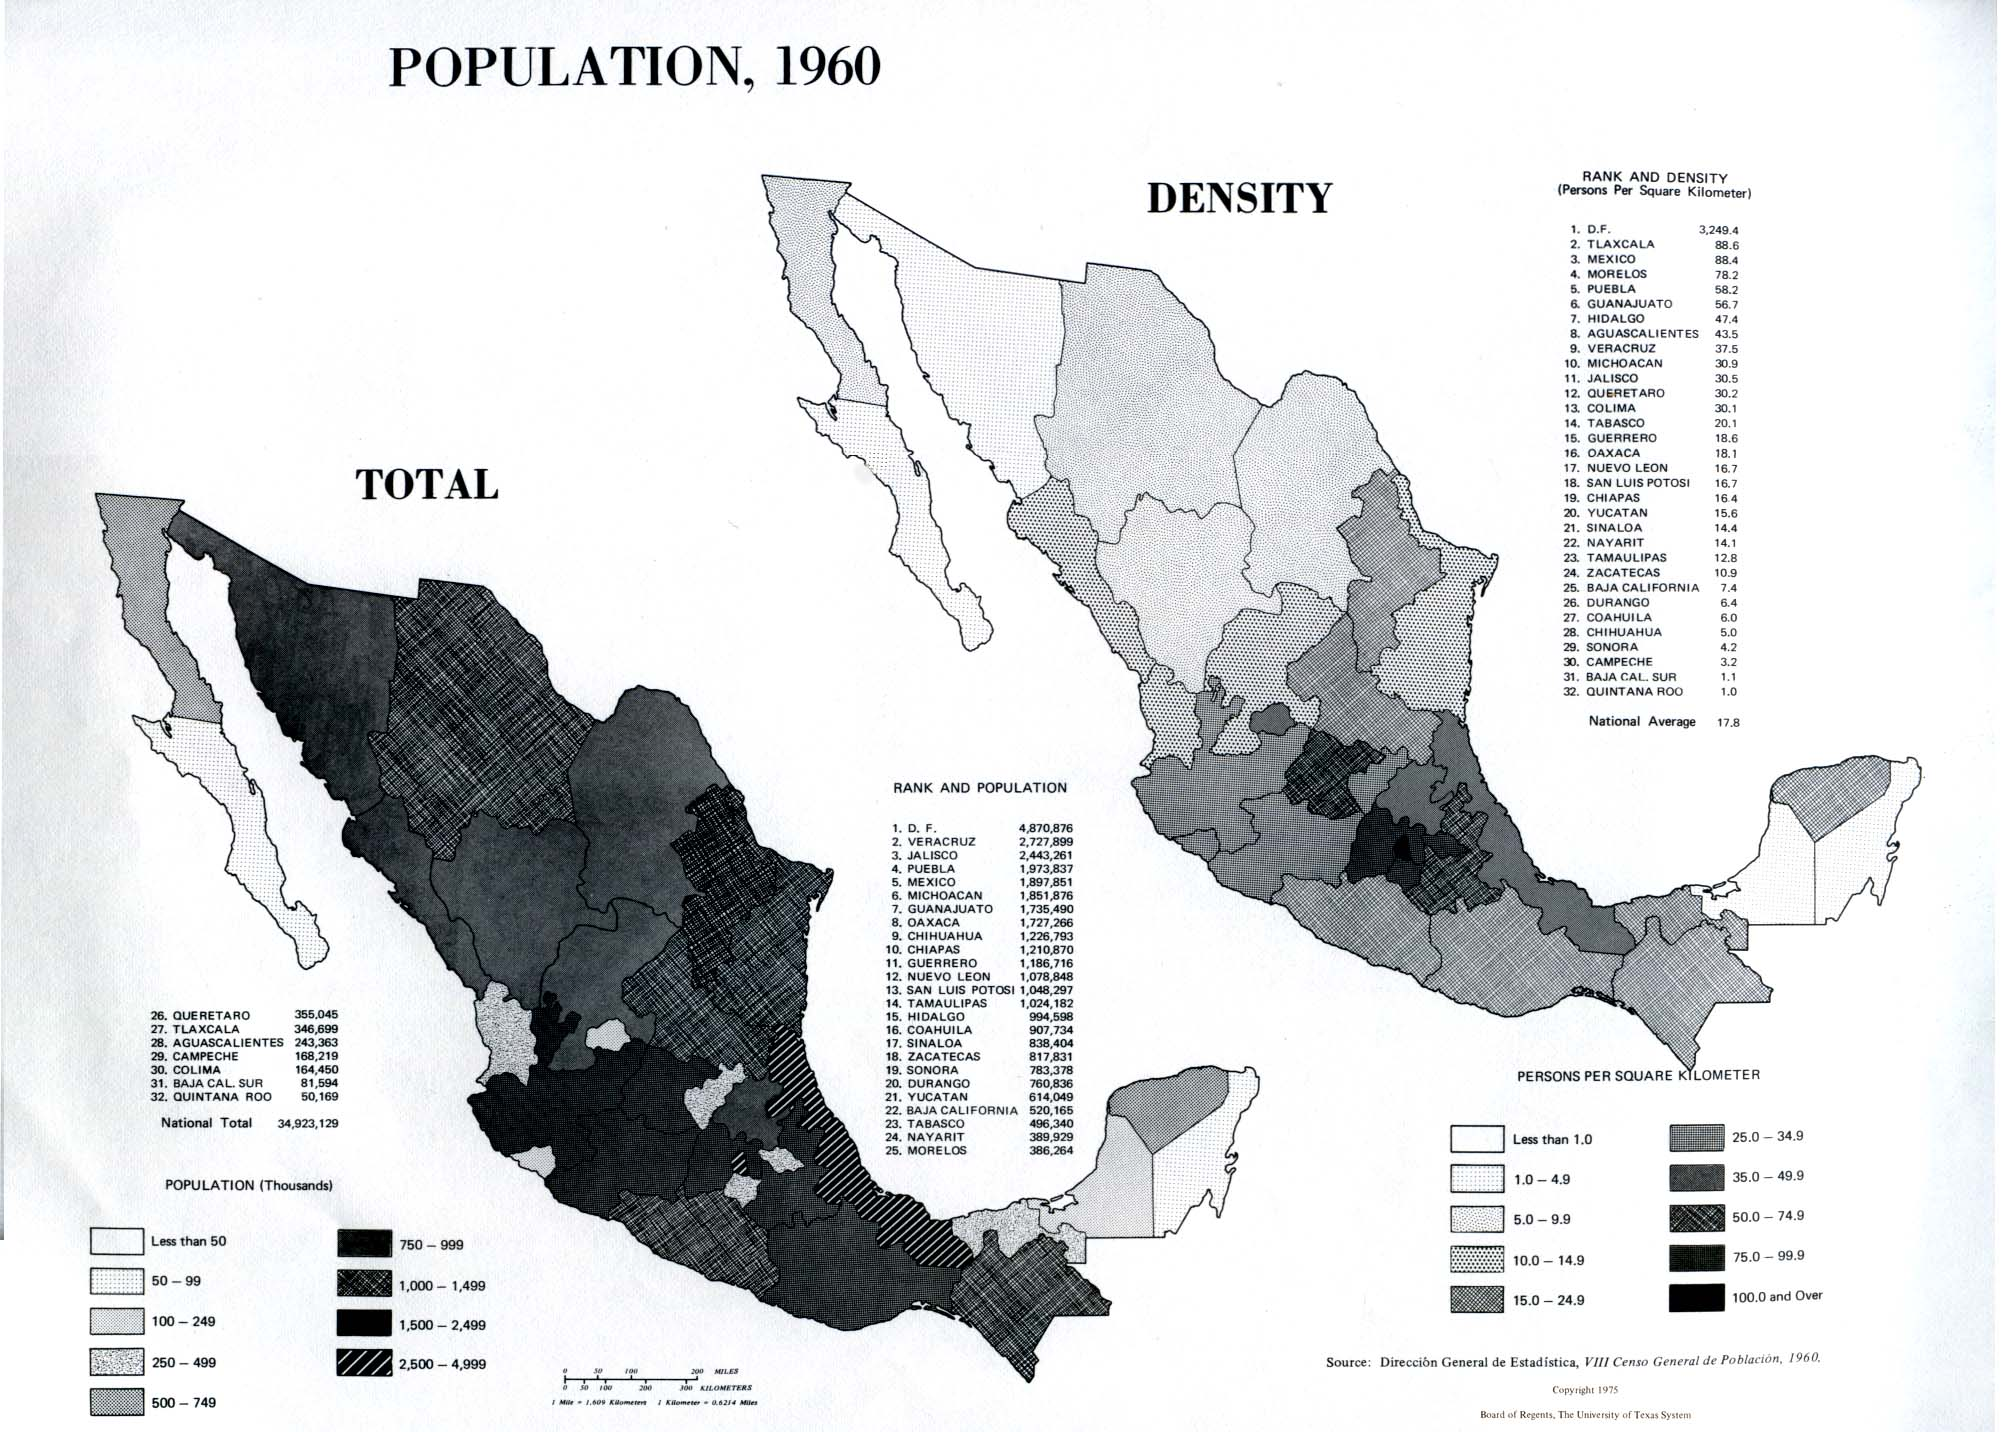 Mapa de Población de Mexico 1960